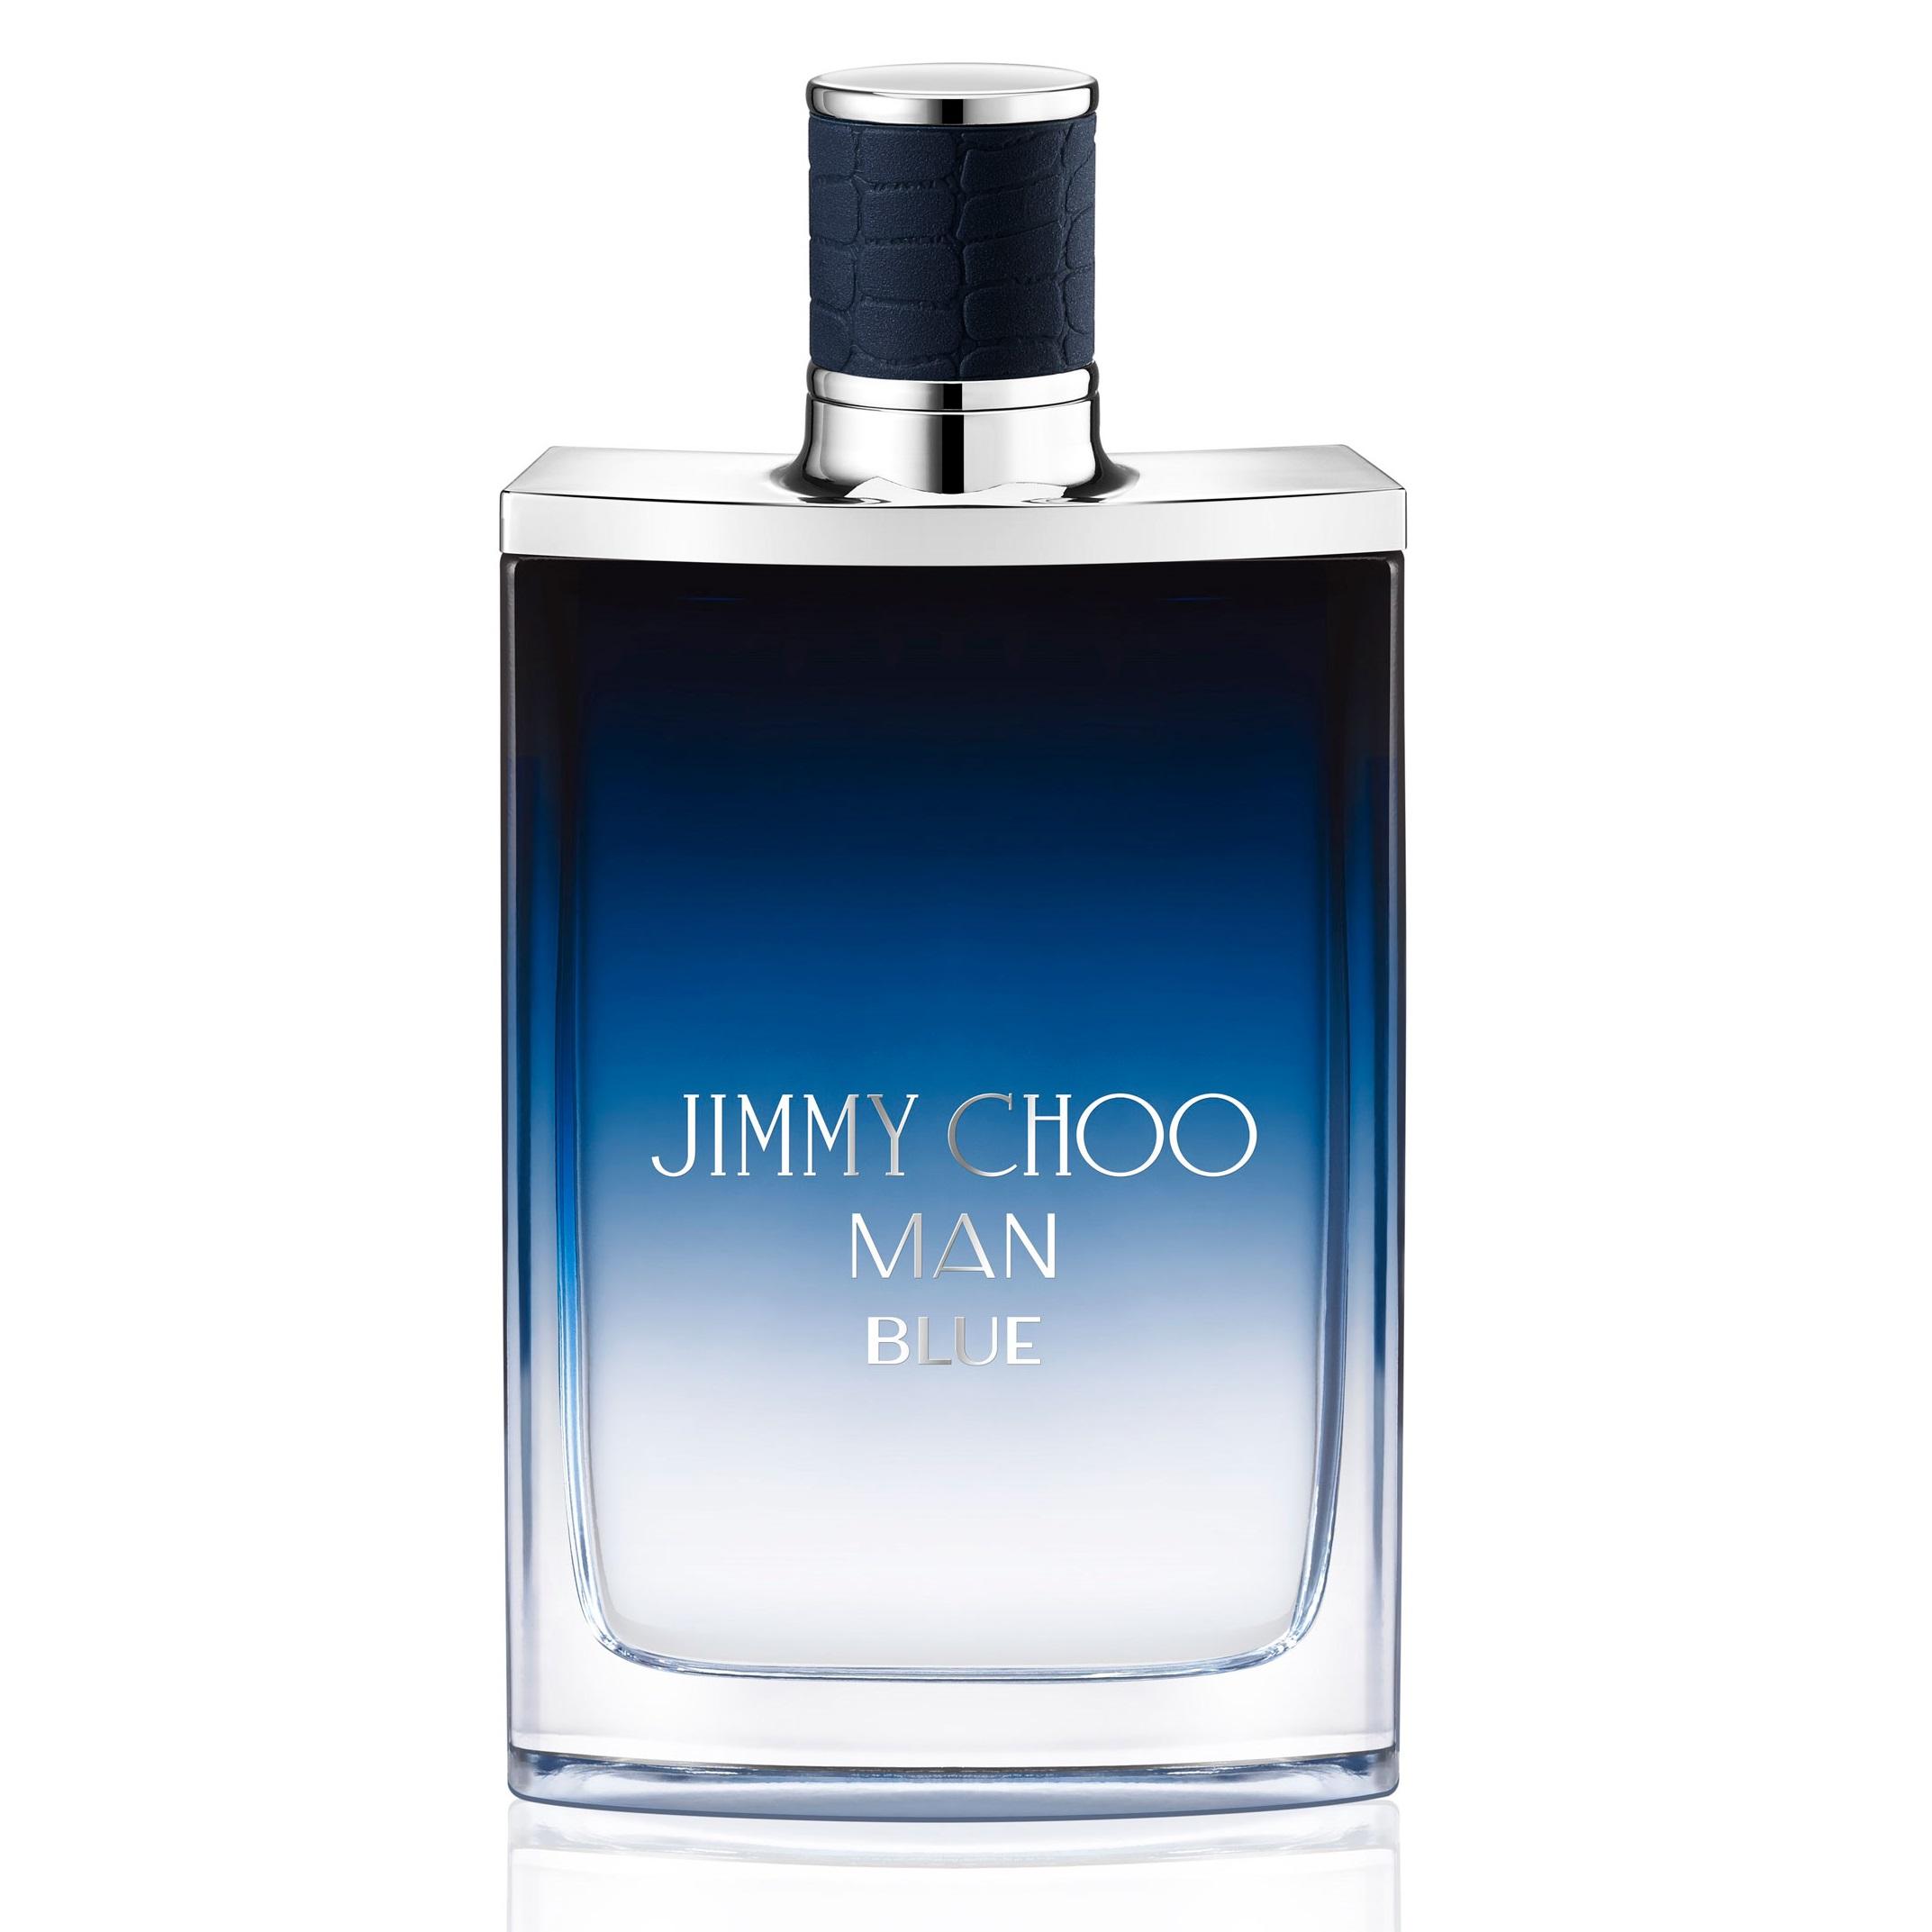 Jimmy Choo - Man Blue EDT 30 ml